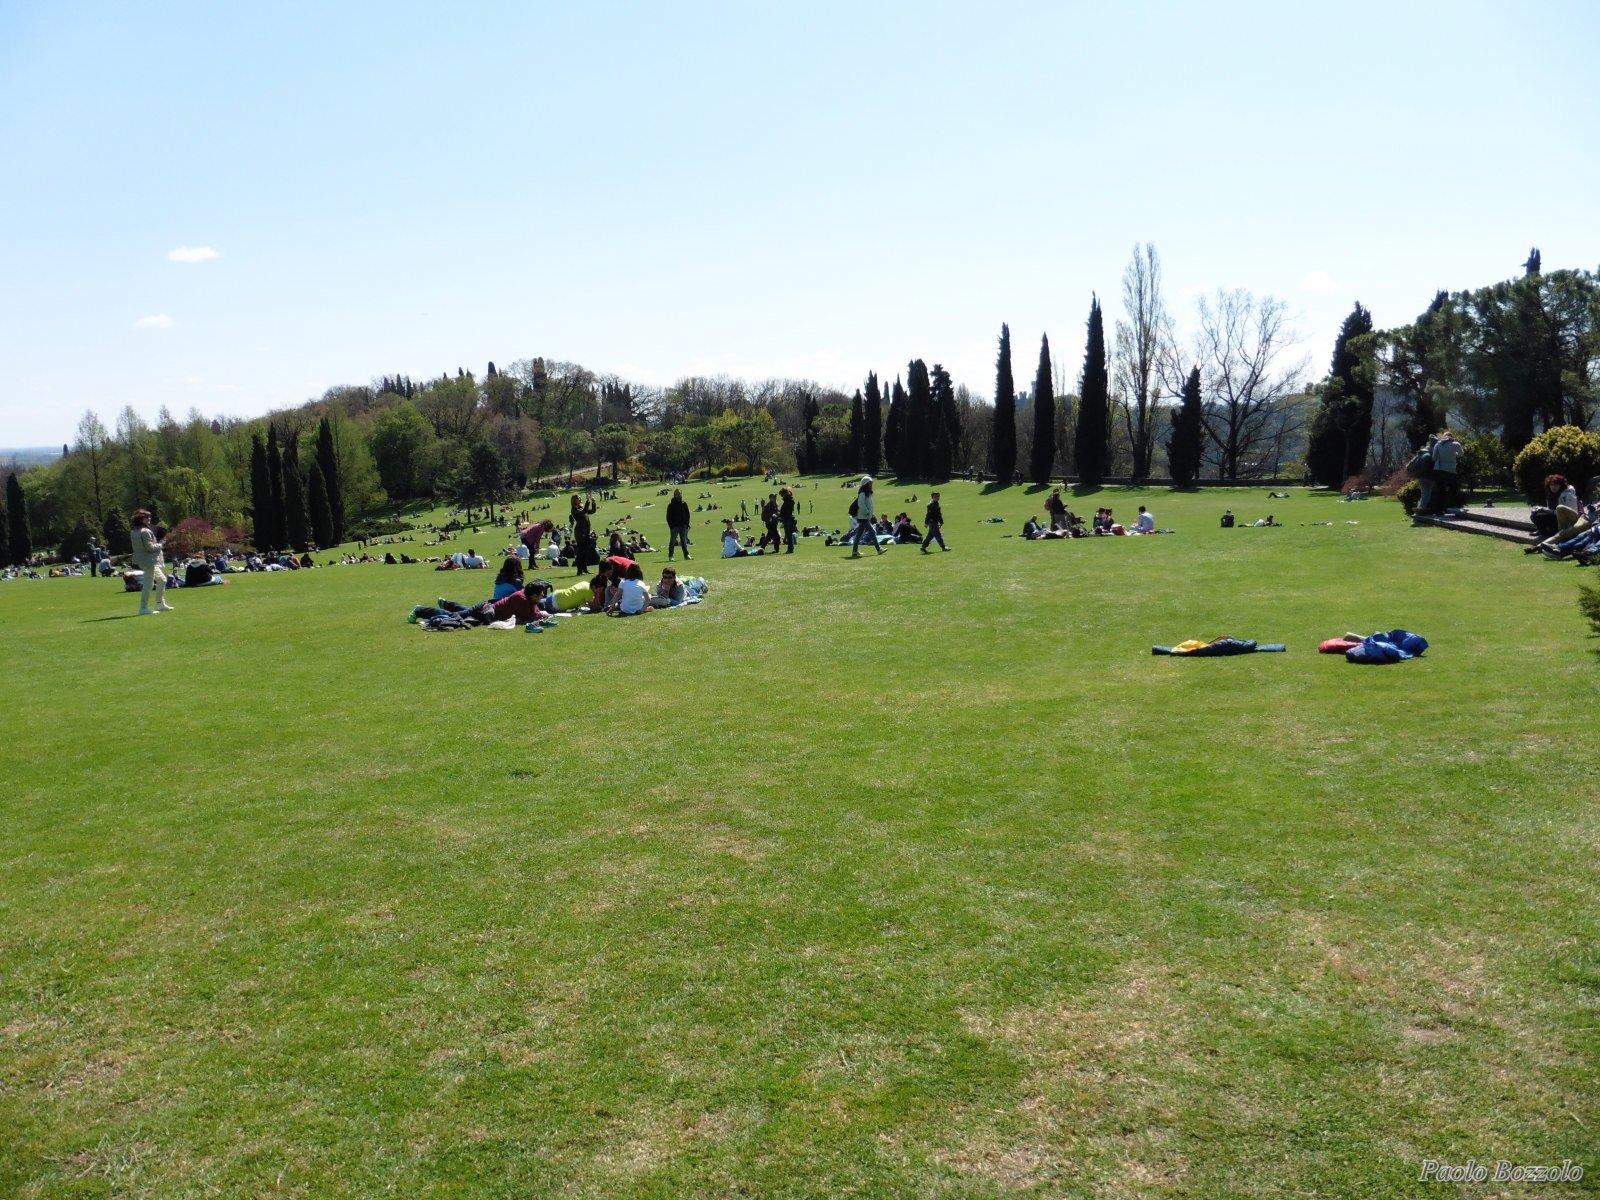 Il parco giardino sigurt a valeggio sul mincio vr enjoy travel and art - Parco giardino sigurta valeggio sul mincio vr ...